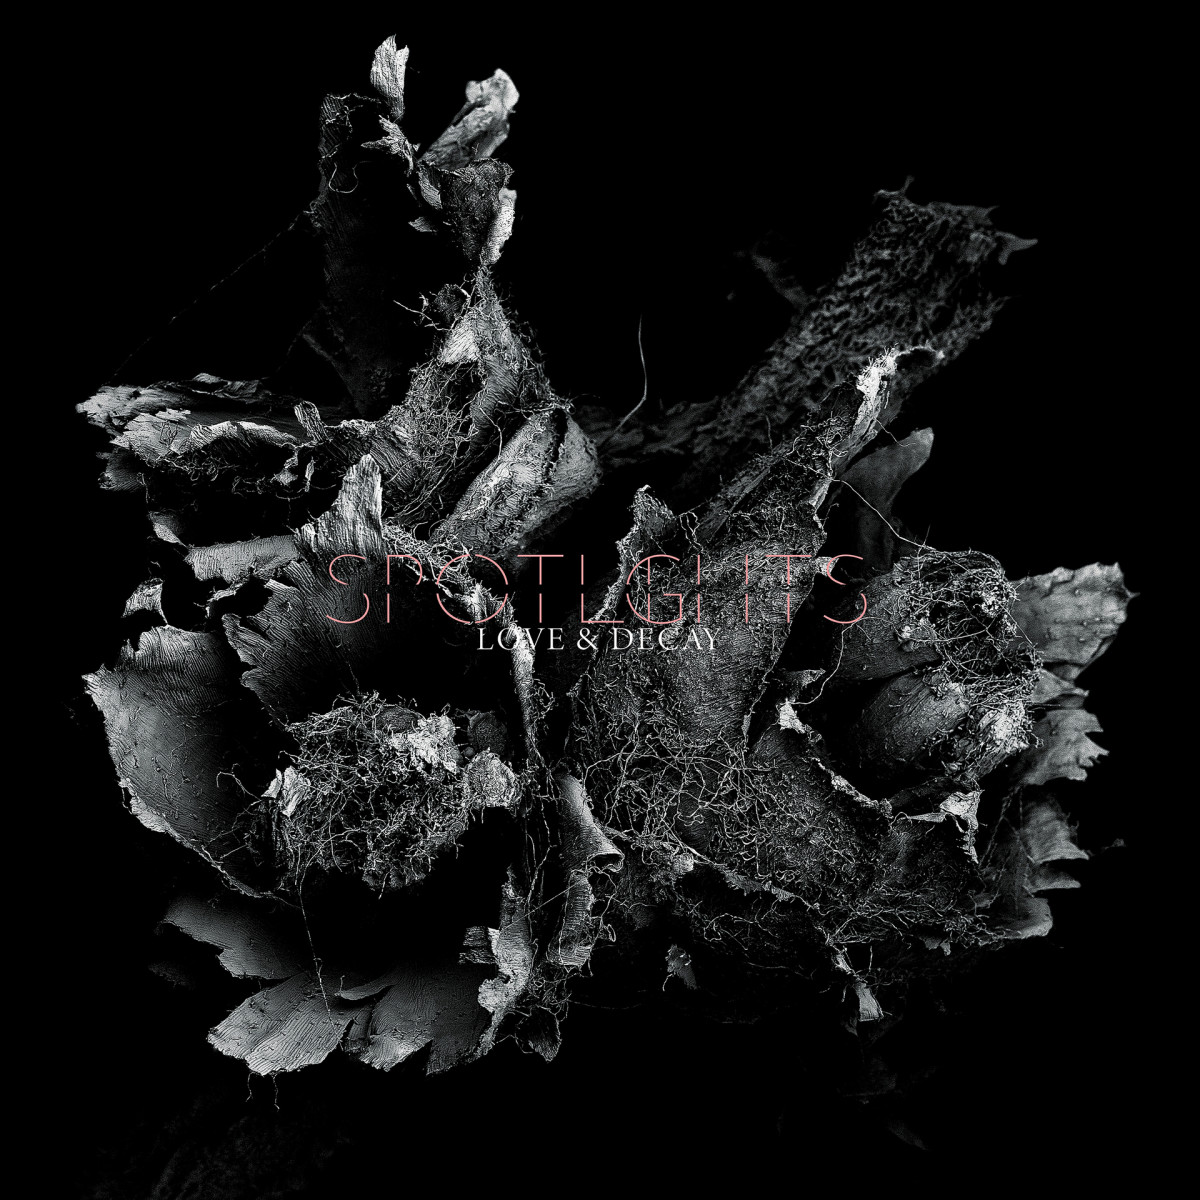 spotlights new album 2019 love and decay